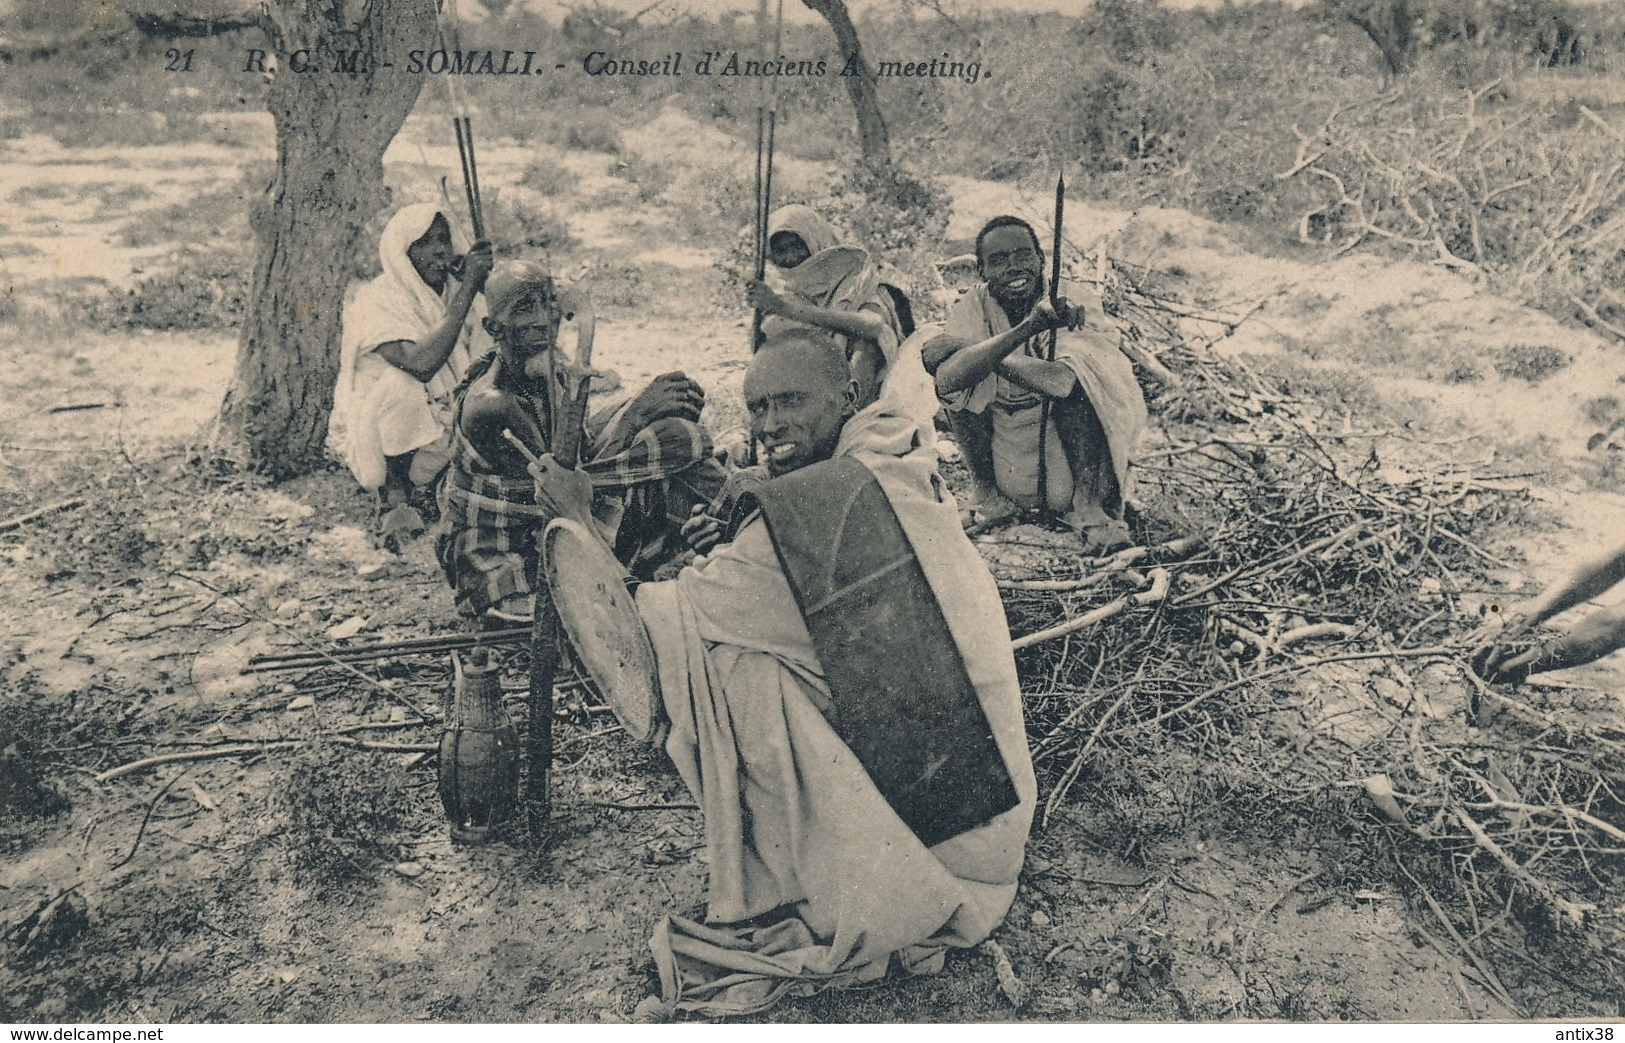 I64 - SOMALIE - SOMALI - Conseil D'Anciens - A. Meeting - Somalie